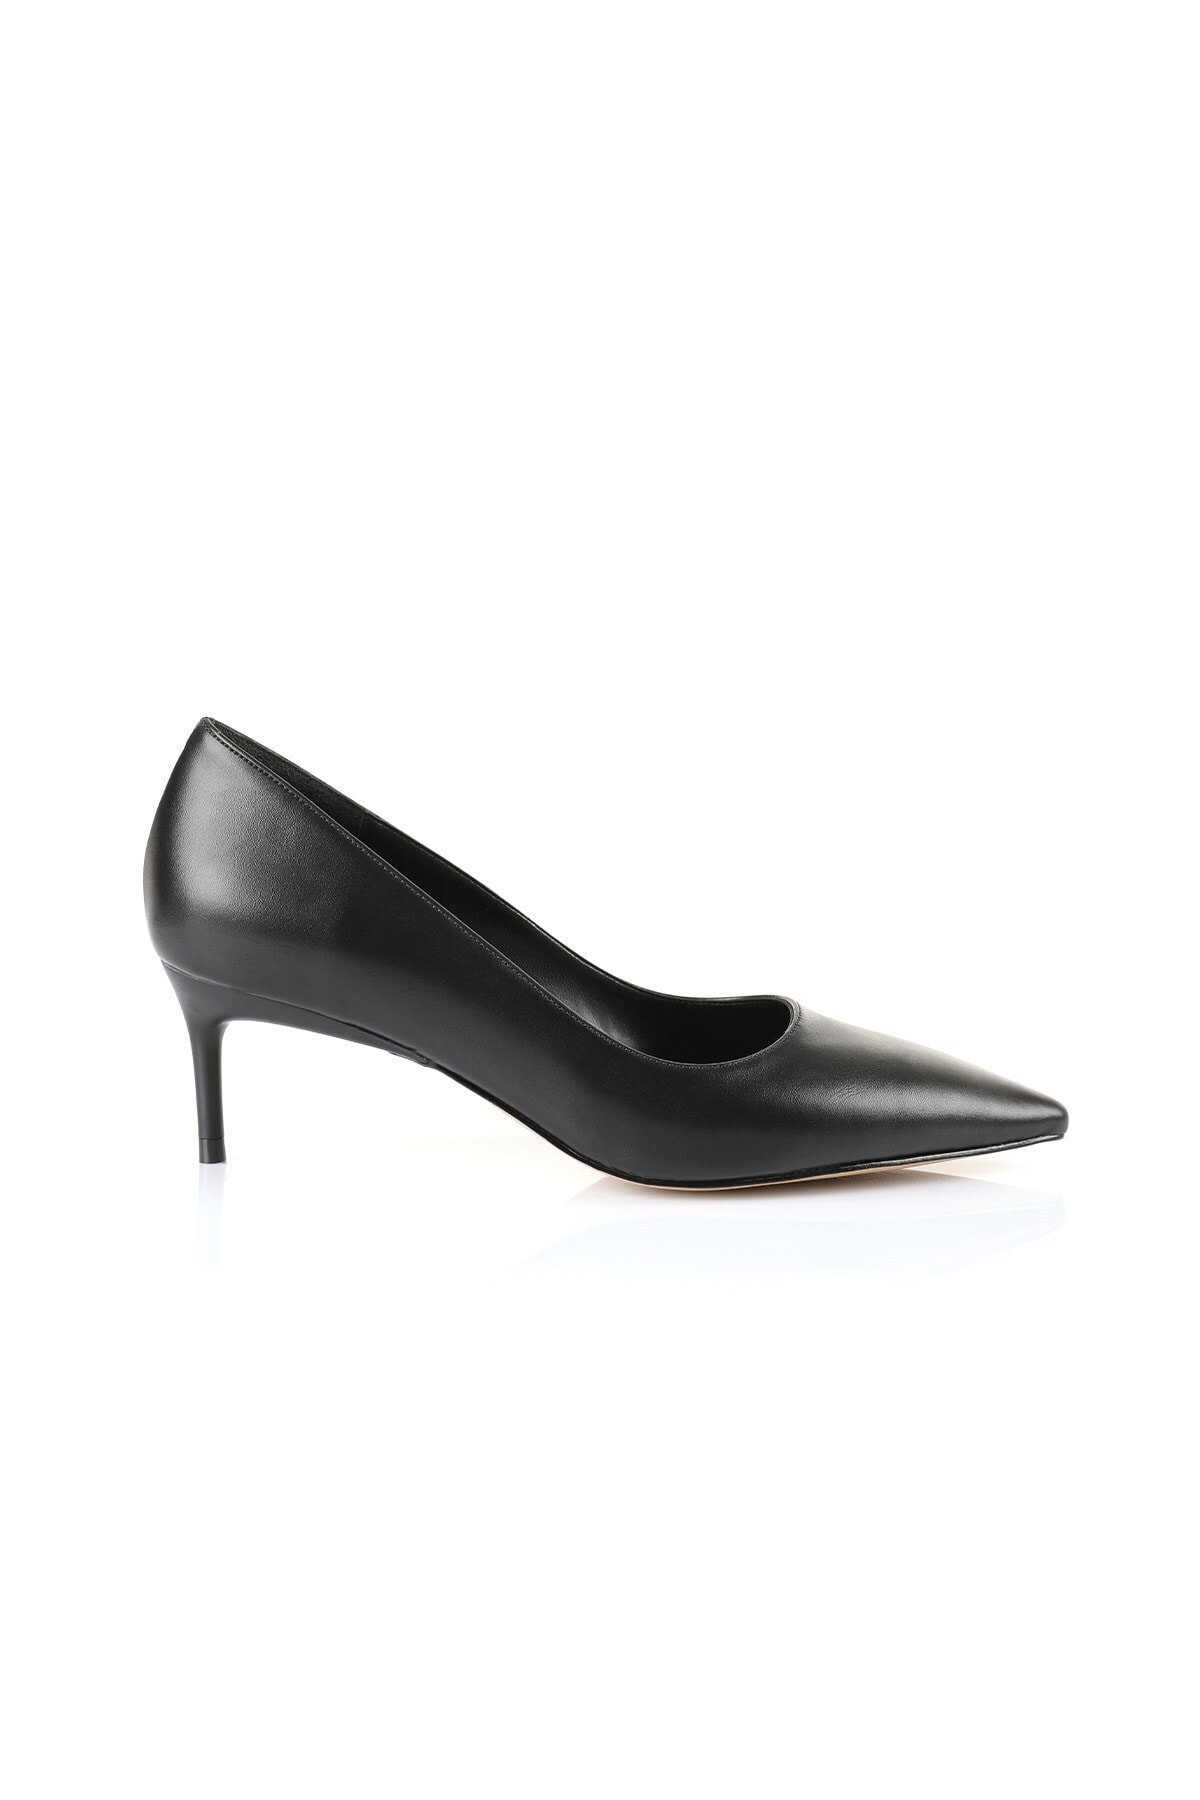 Oblavion Lenna Siyah Kısa Topuk Stiletto 1